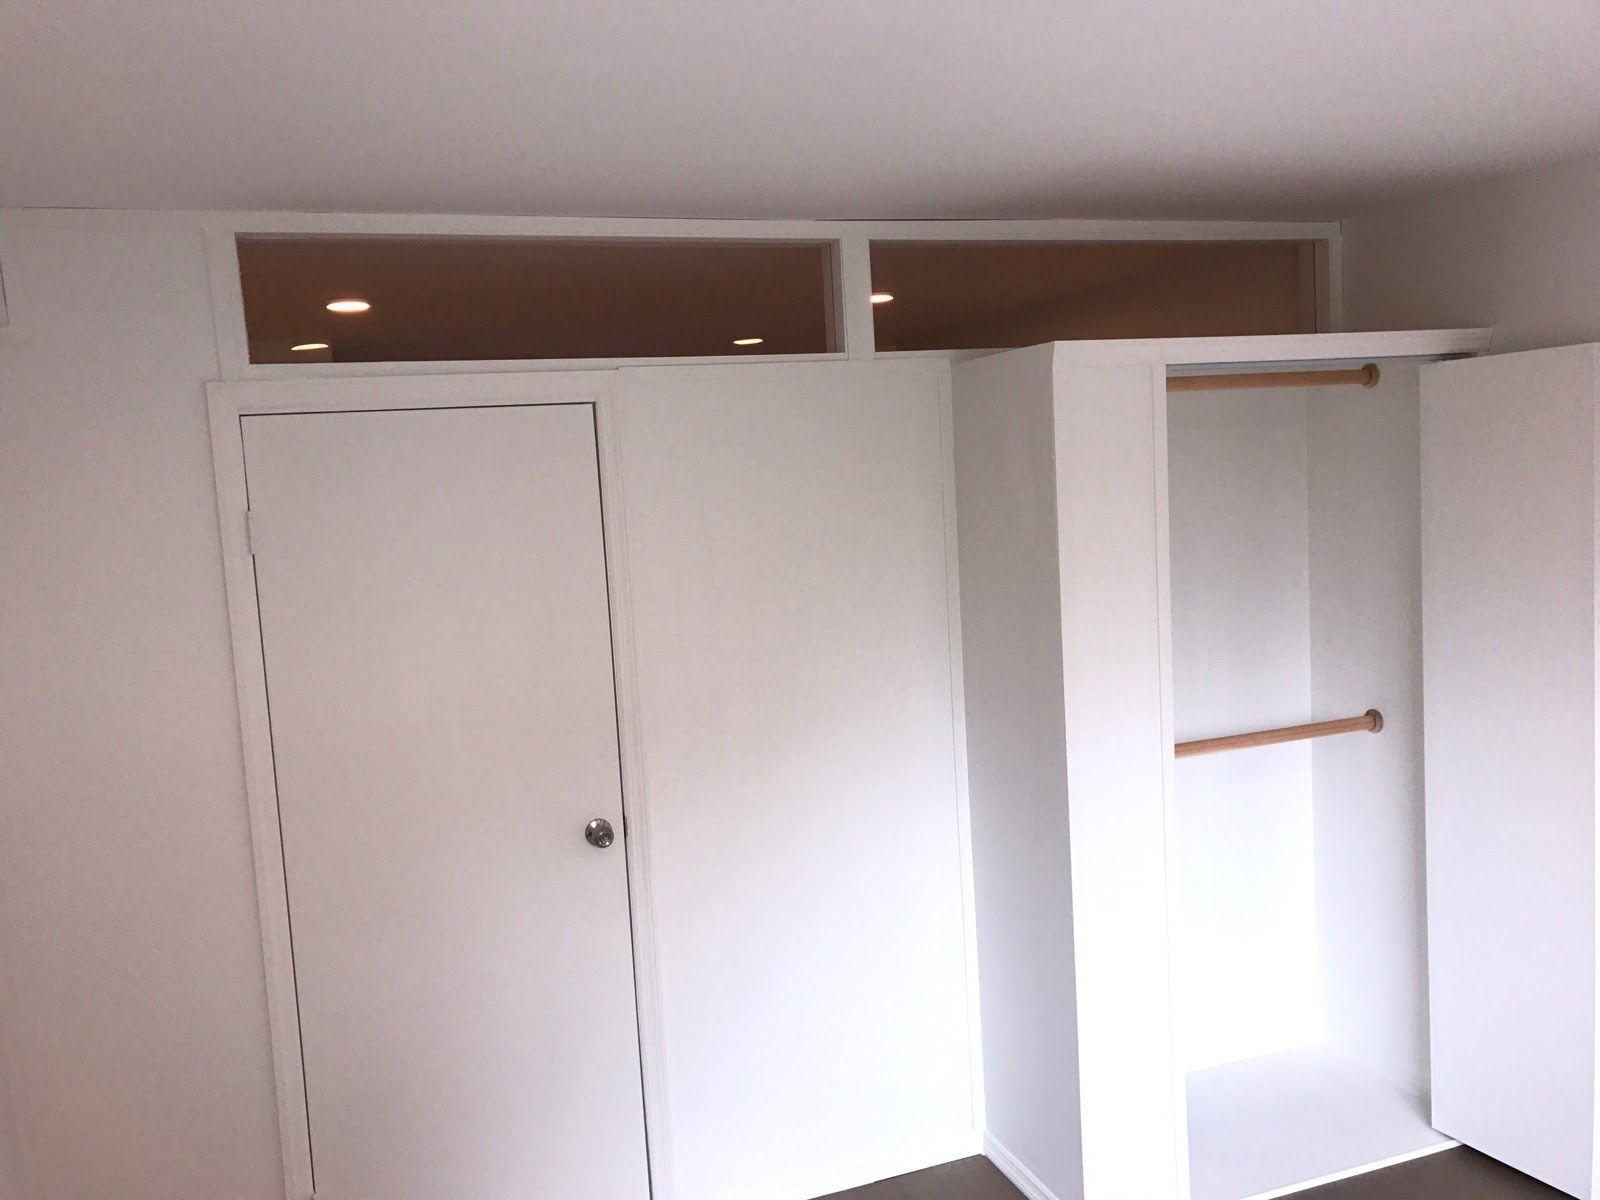 custom temporary wall with plexiglass transom and closet call us for all your custom room